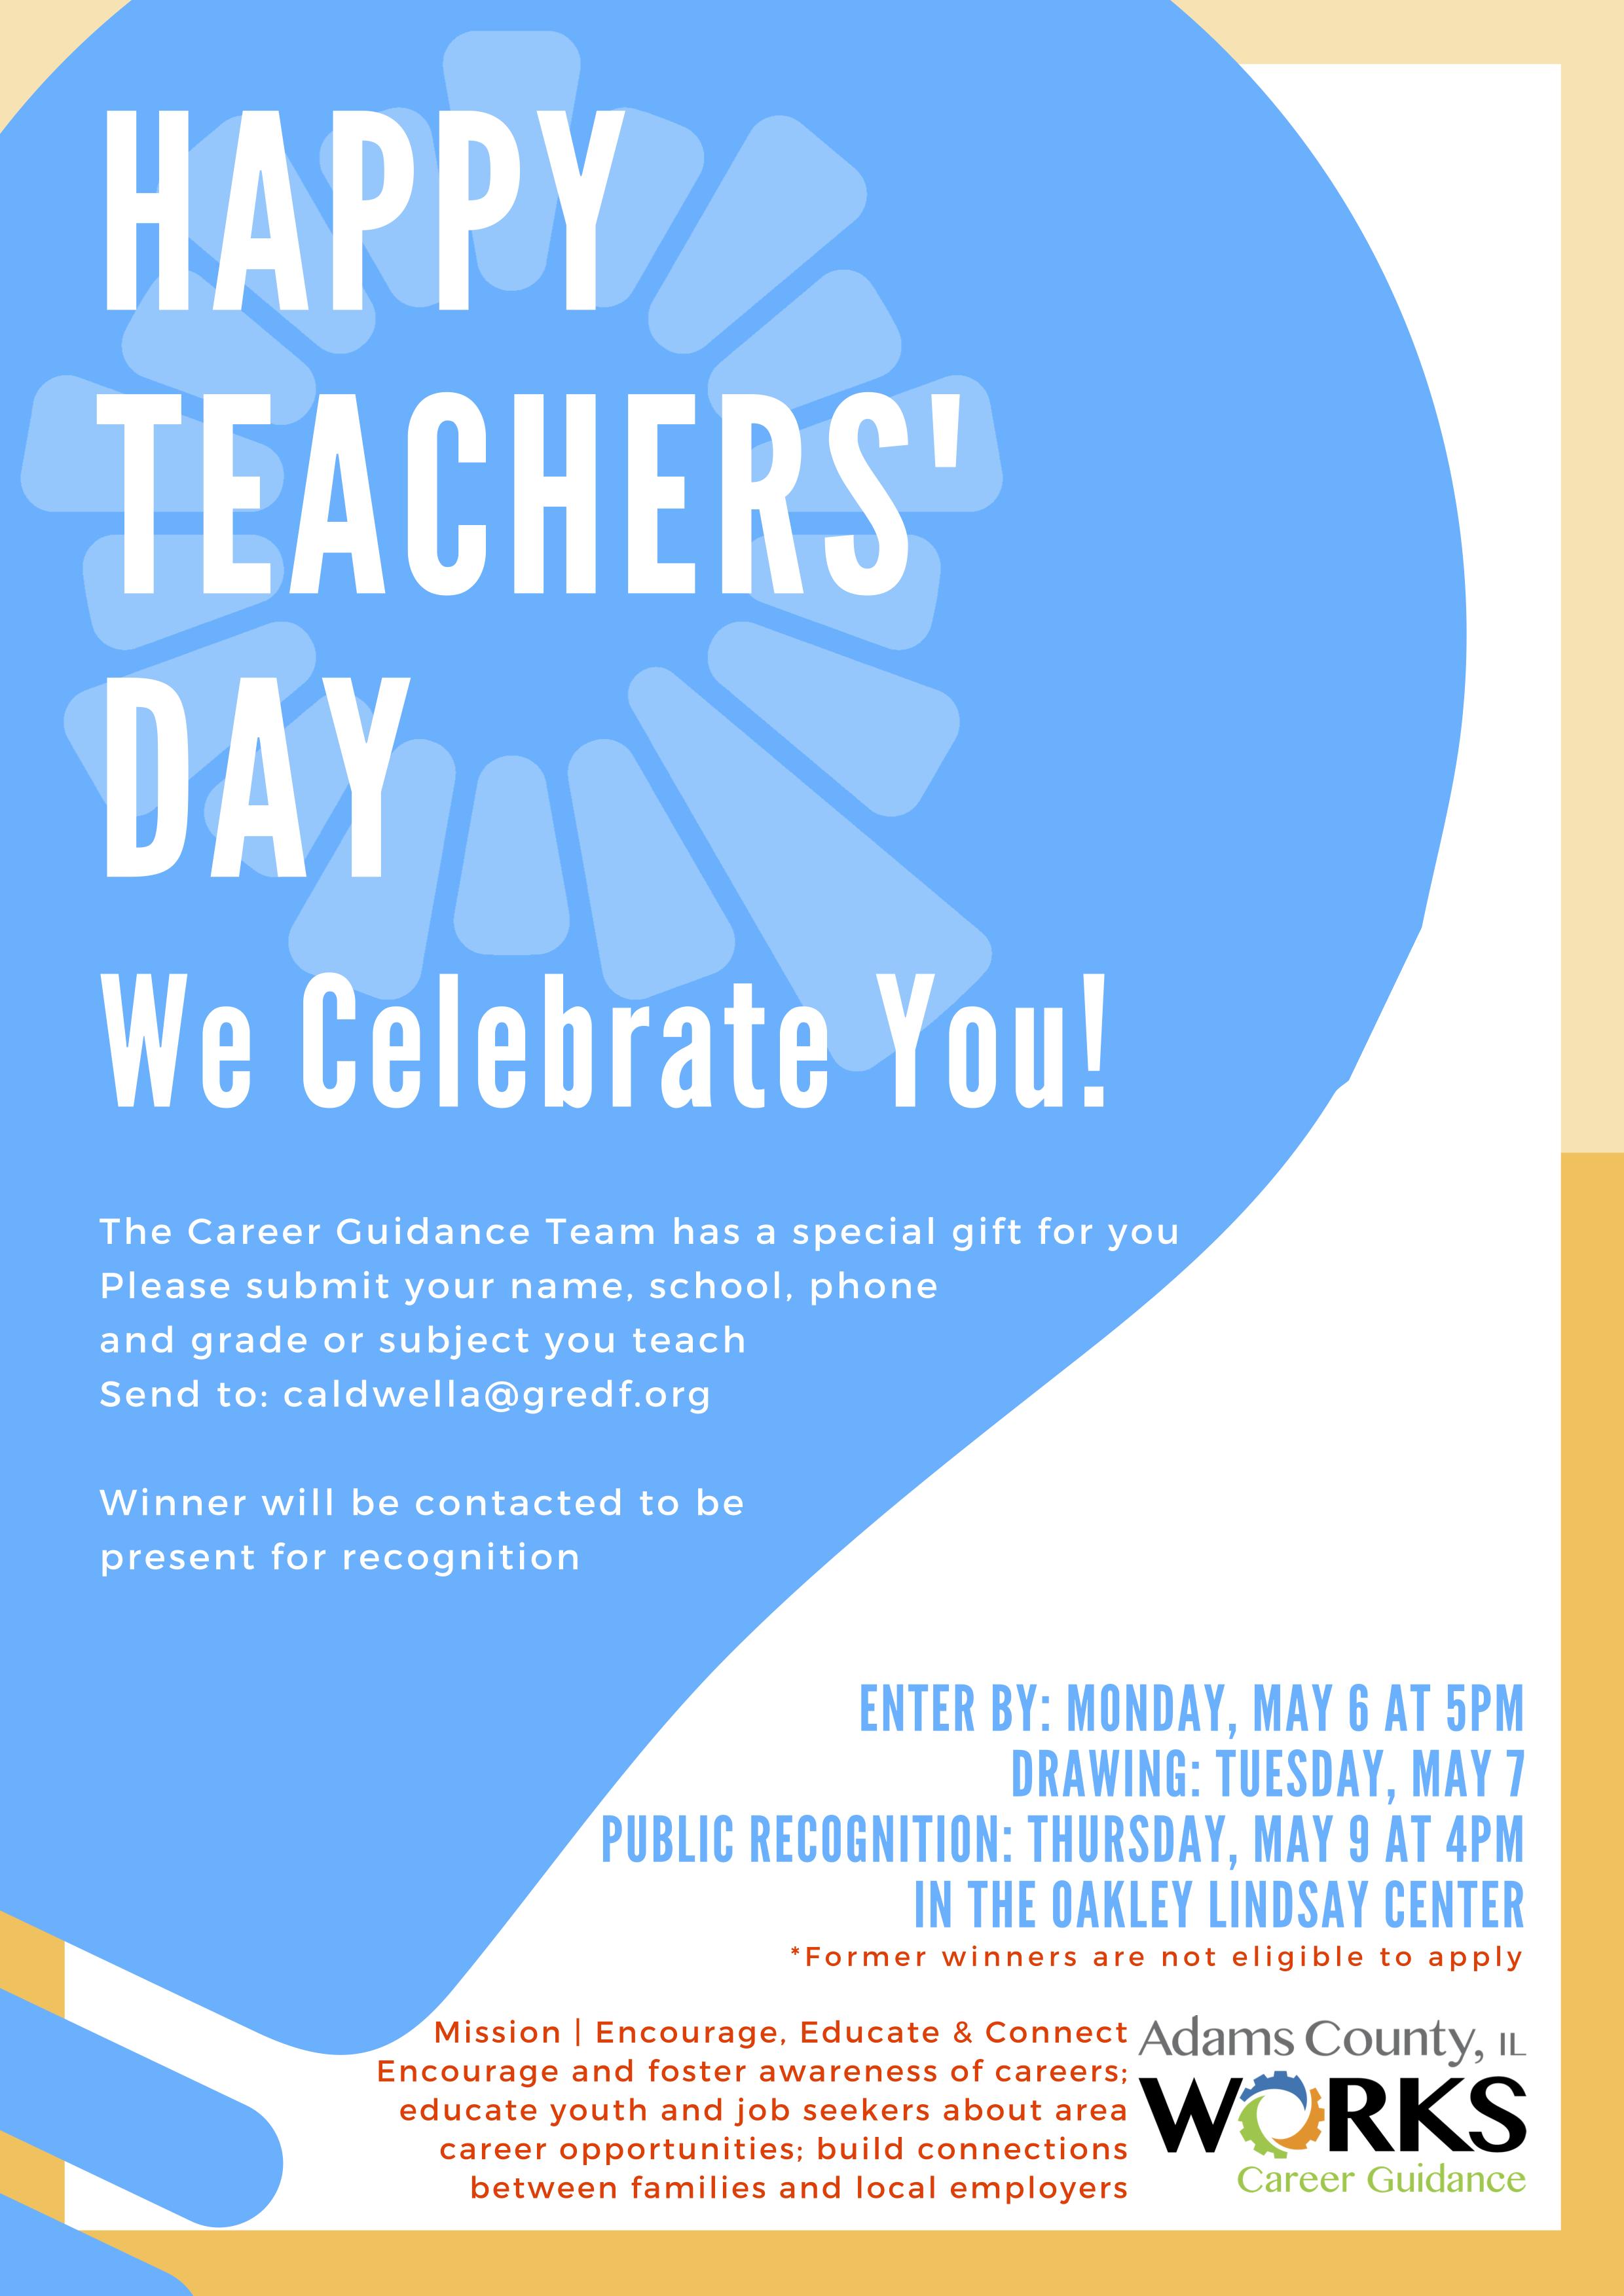 Career Guidance Team Celebrates Area Educators